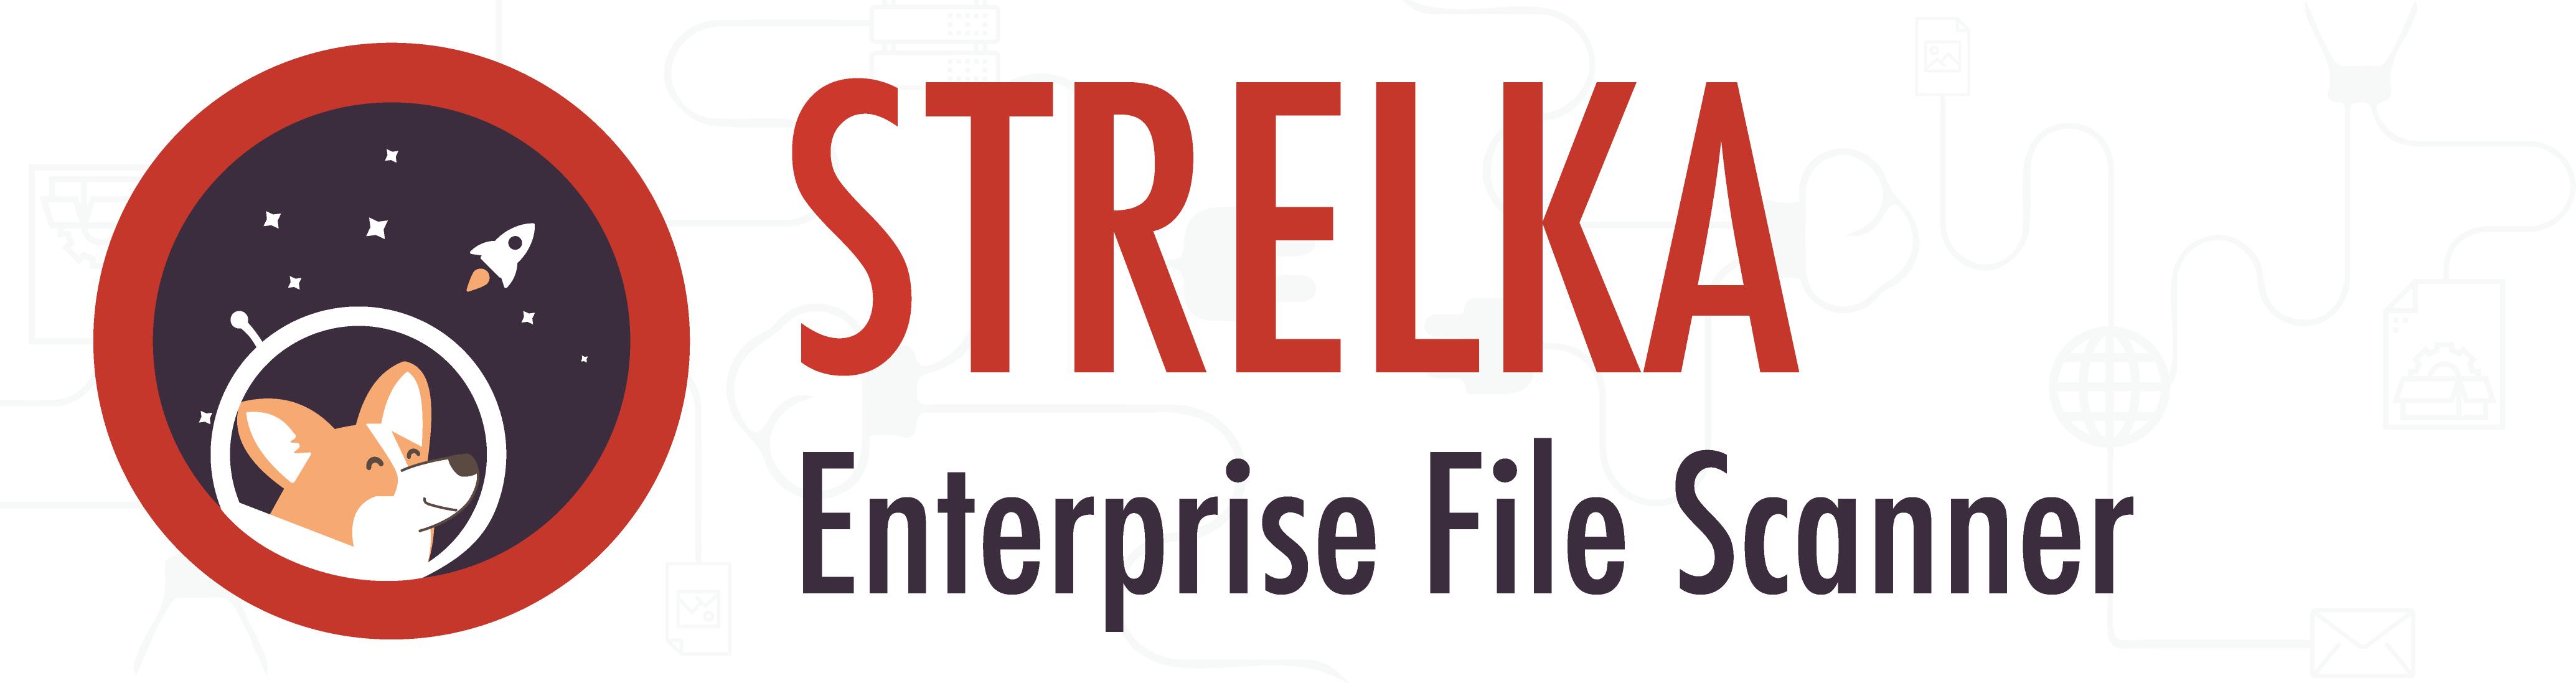 Strelka Banner